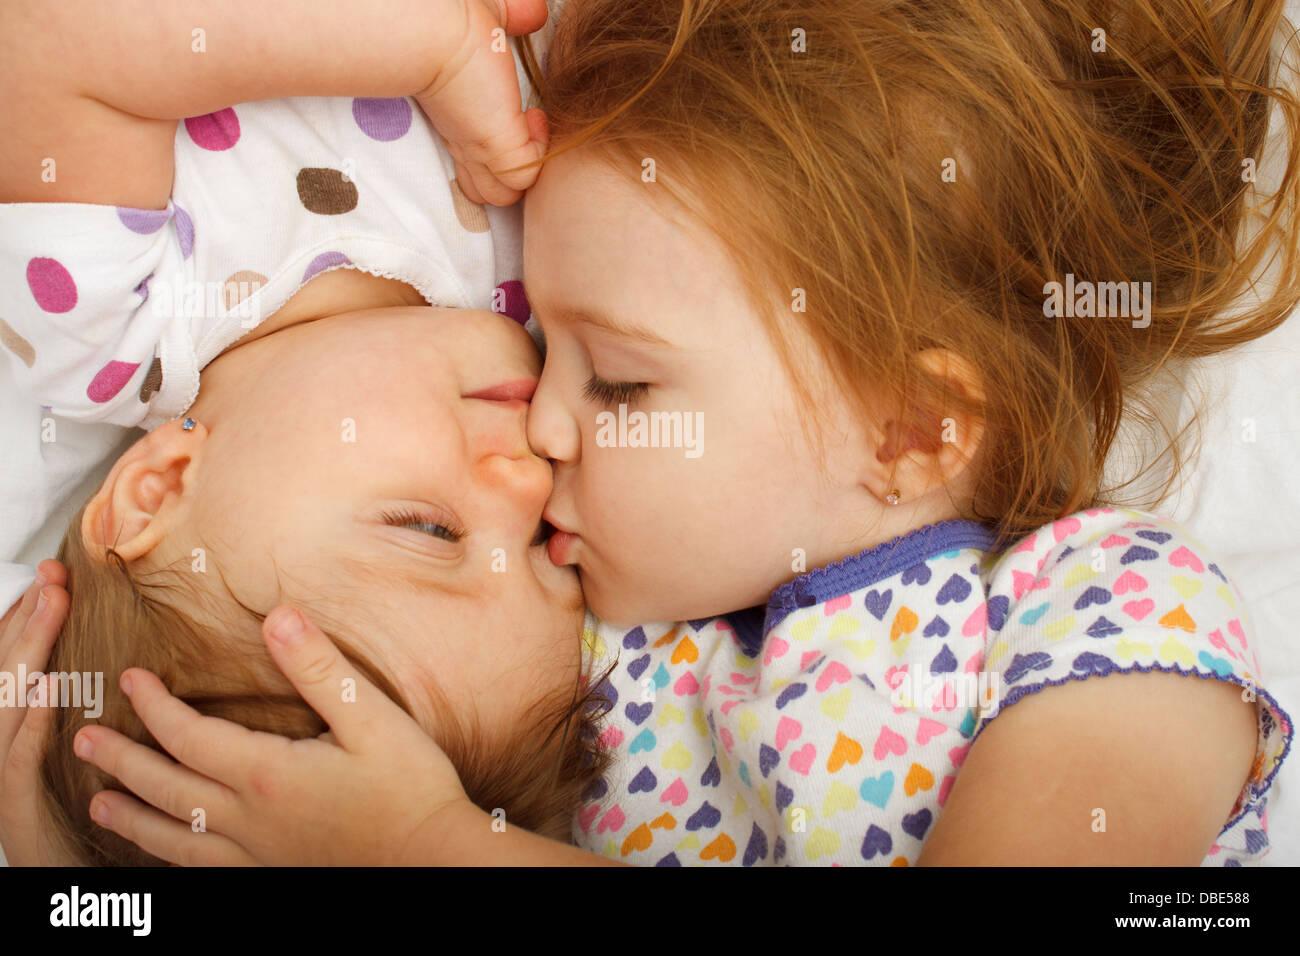 La hermana mayor de besar al bebé en la cuna Imagen De Stock